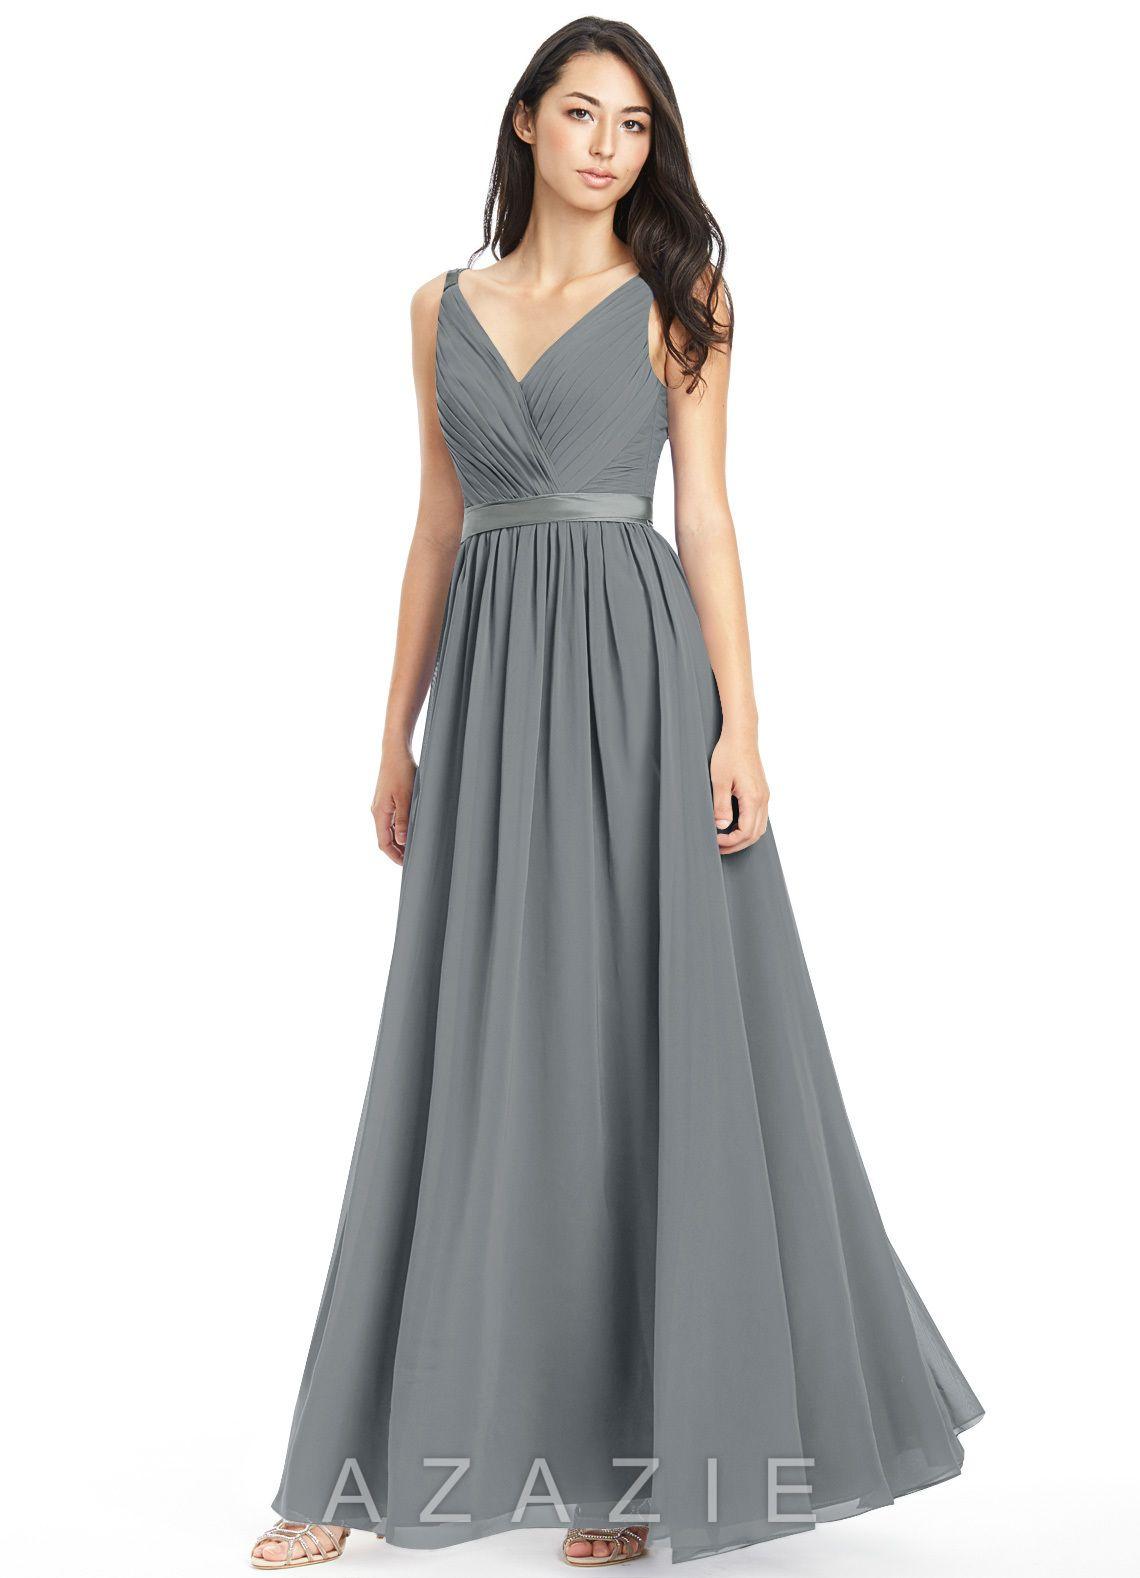 Shop azazie bridesmaid dress leanna in chiffon find the perfect leanna bridesmaid dress ombrellifo Images